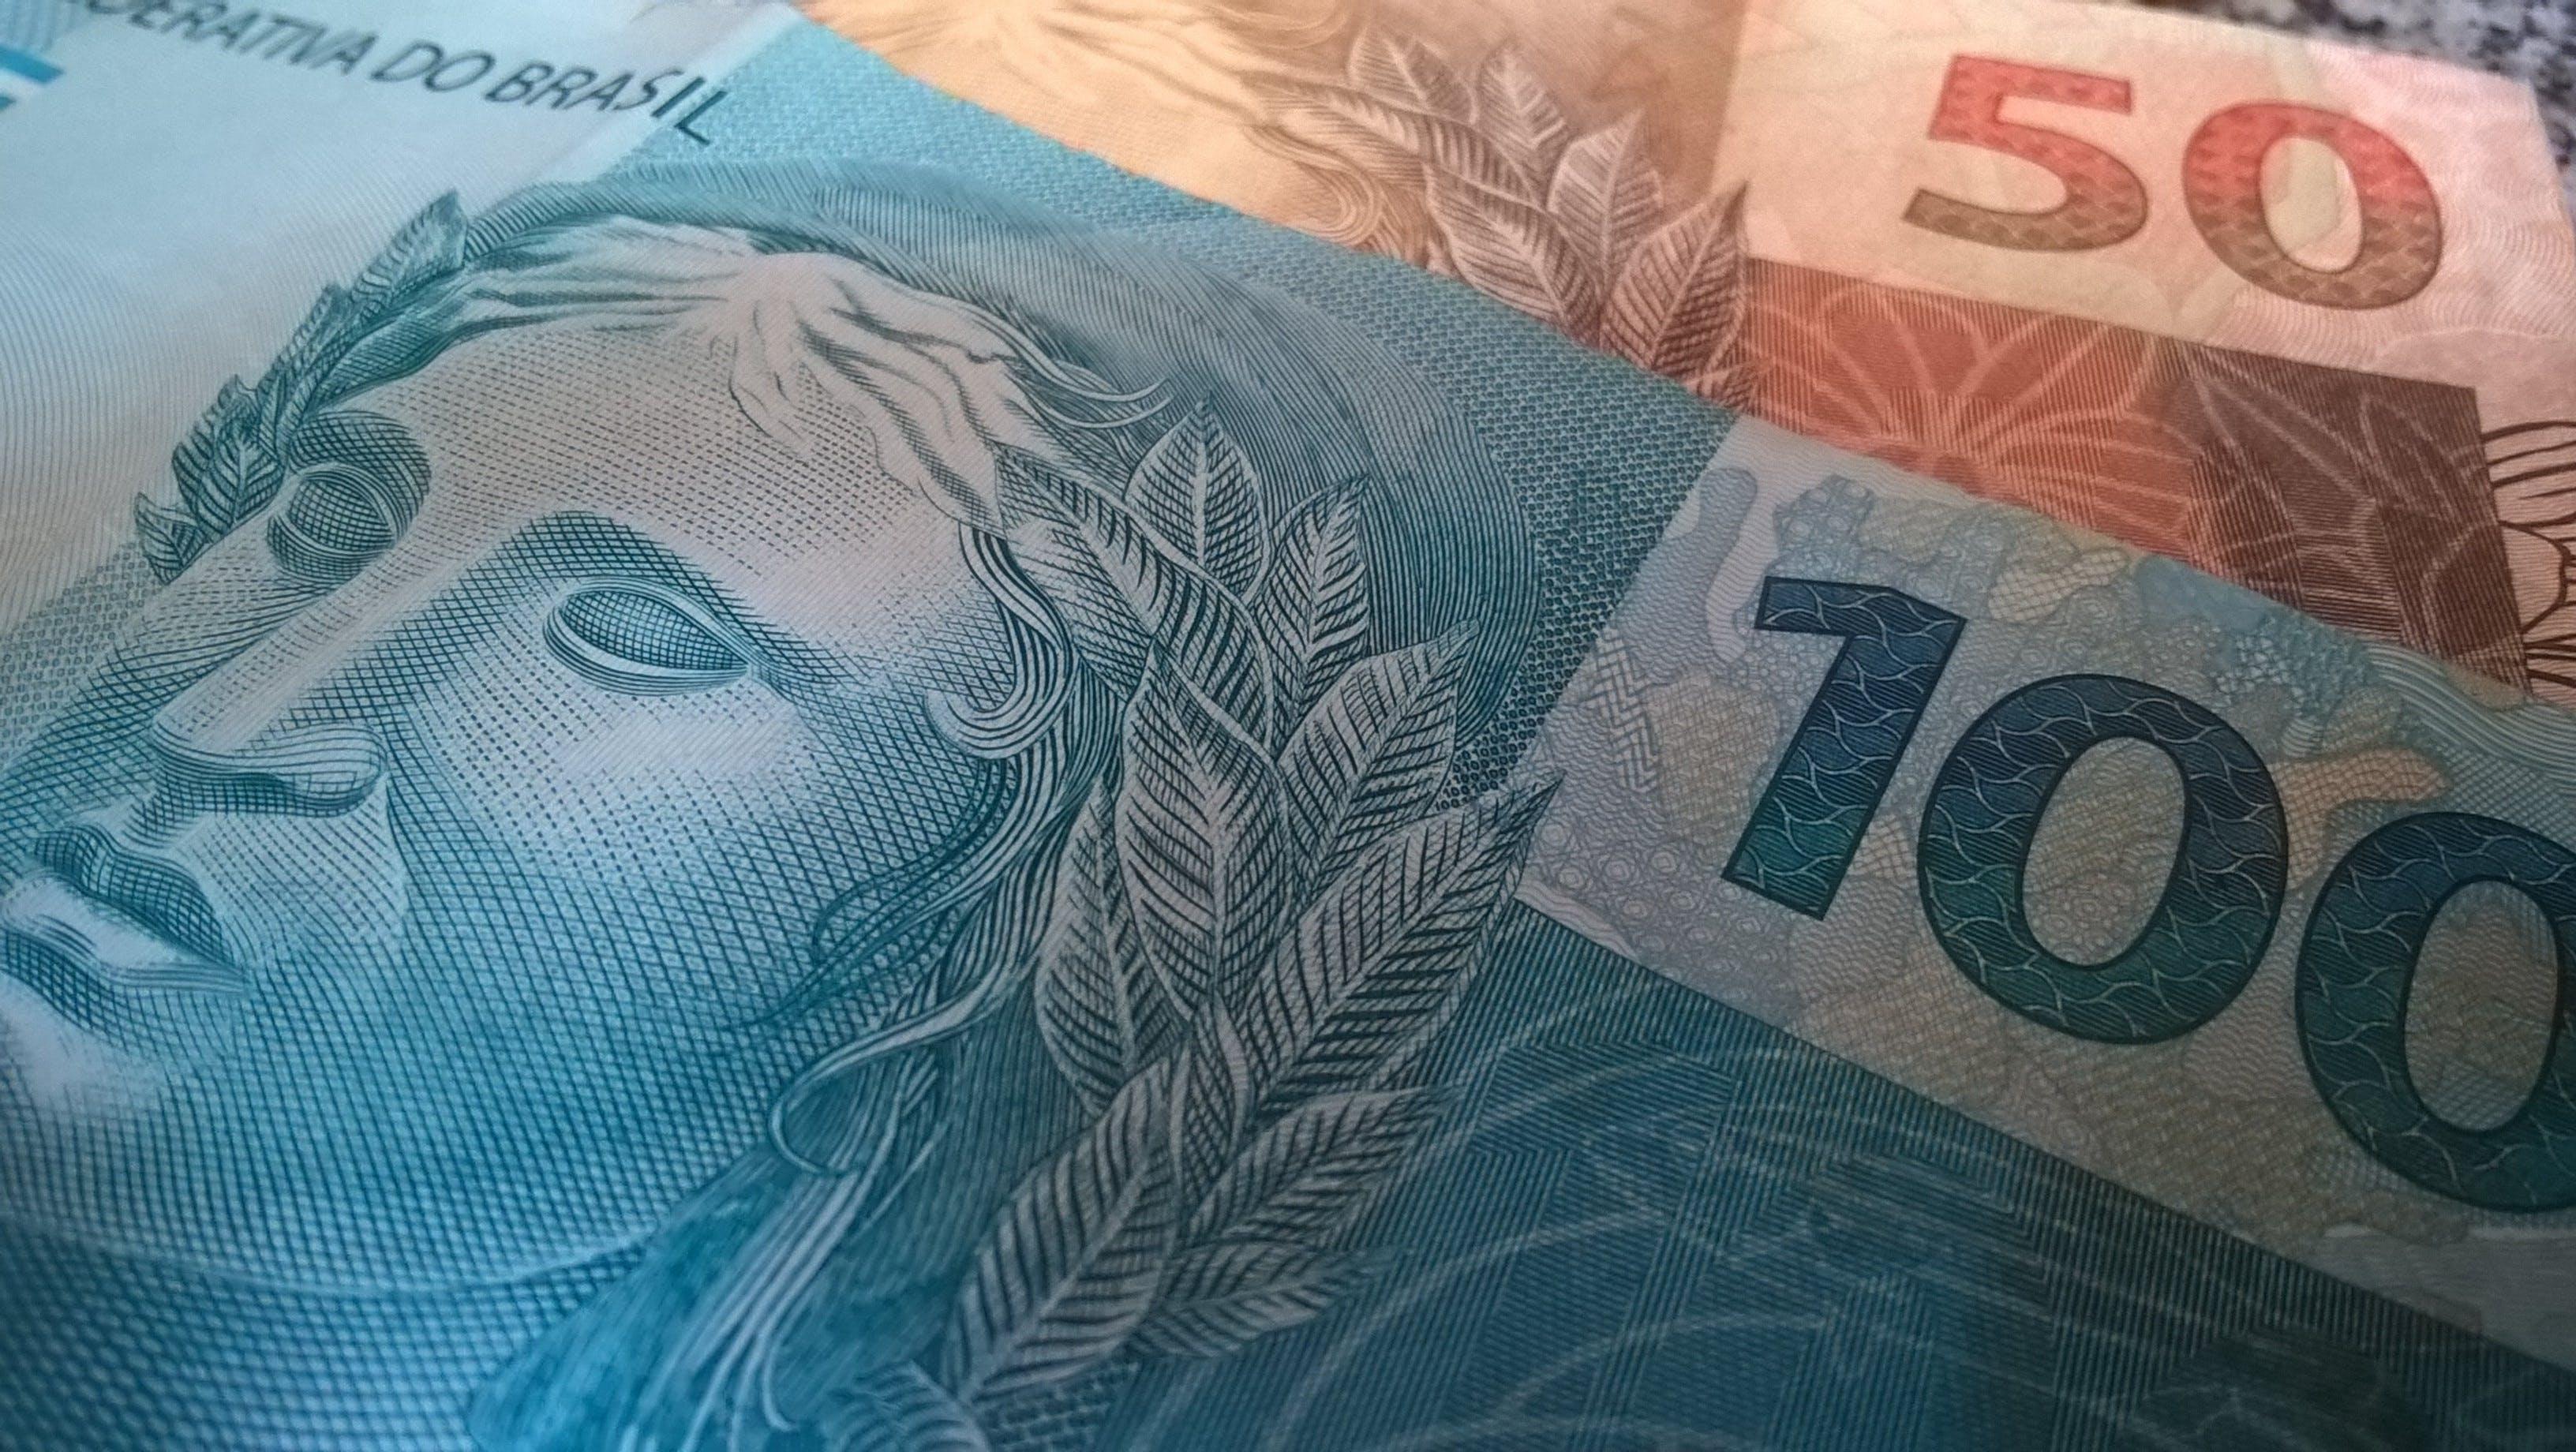 100 and 50 Brazilian Reais Banknotes